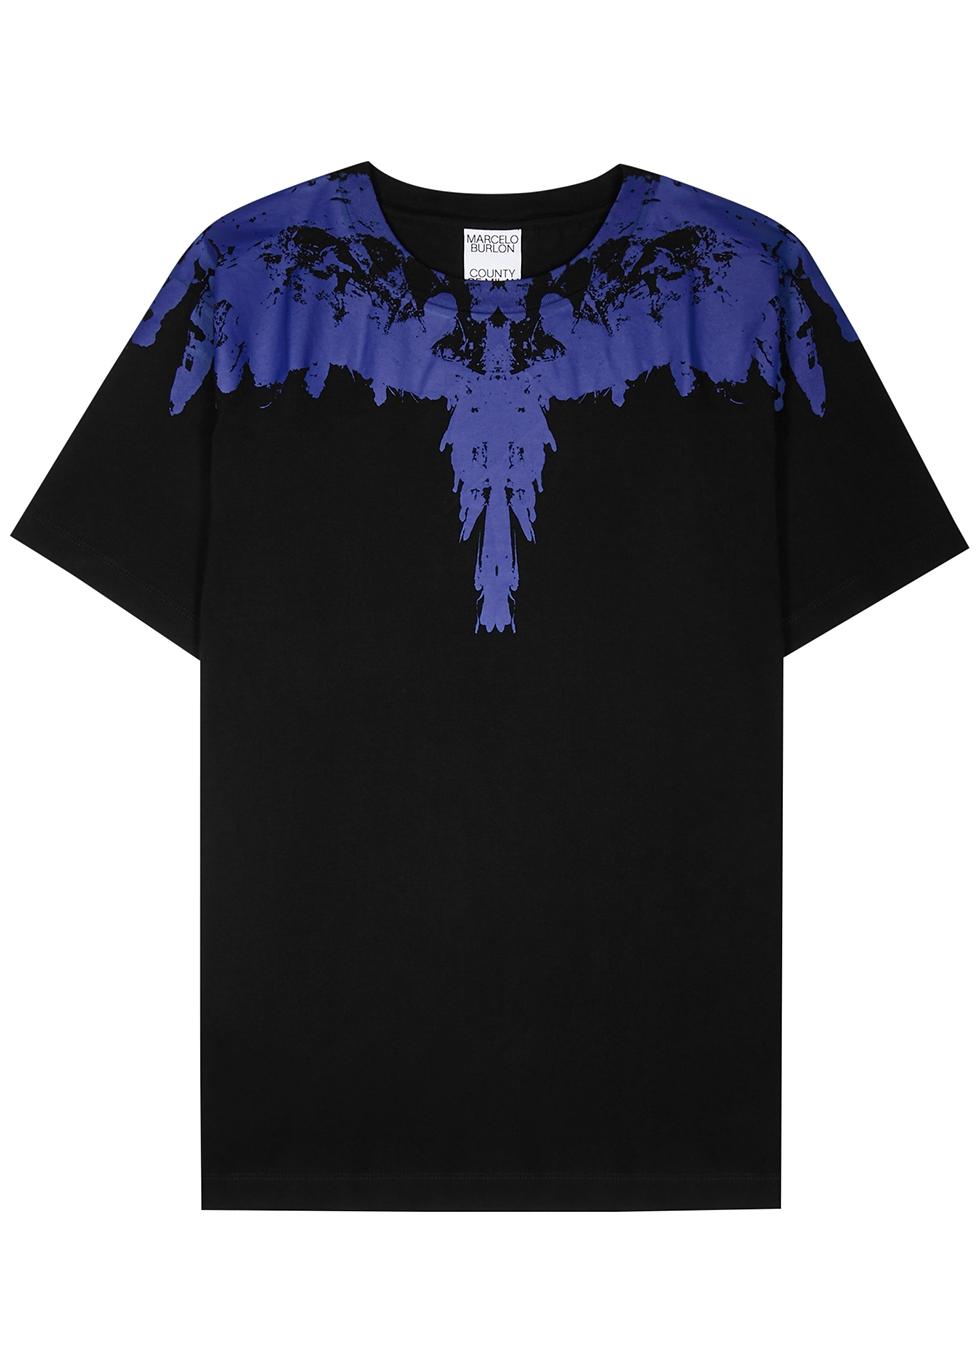 Tempera Wings printed cotton T-shirt